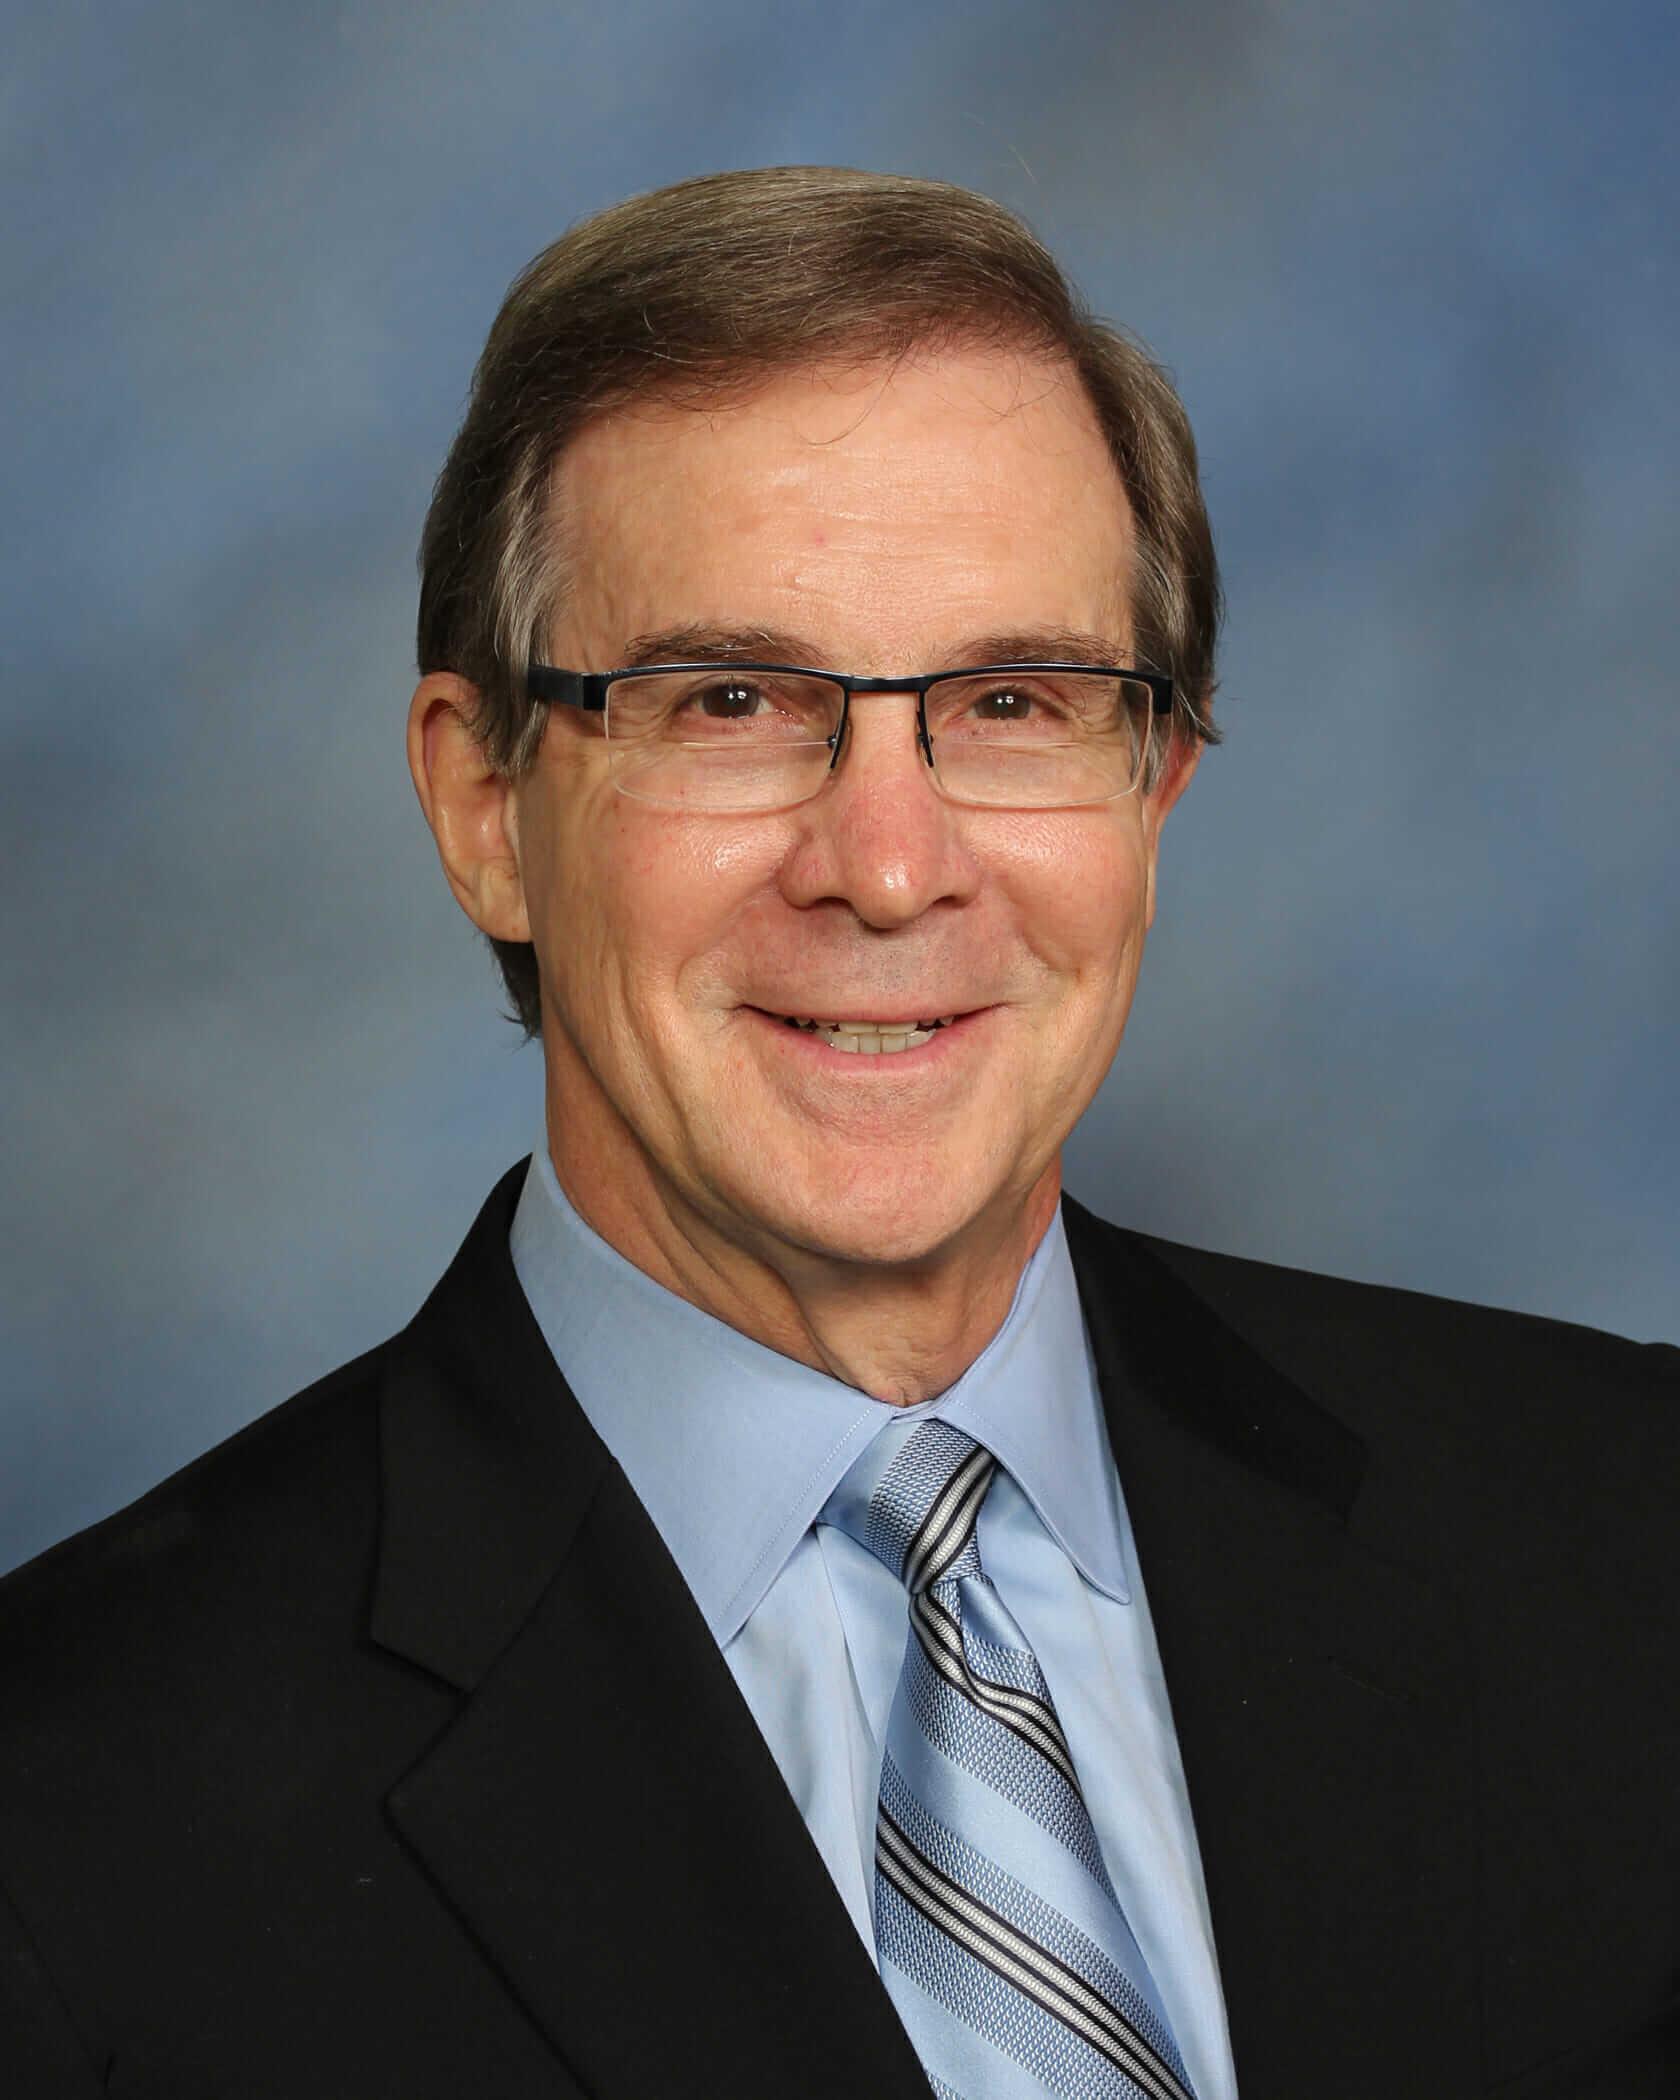 Phillip R. Langsdon, MD